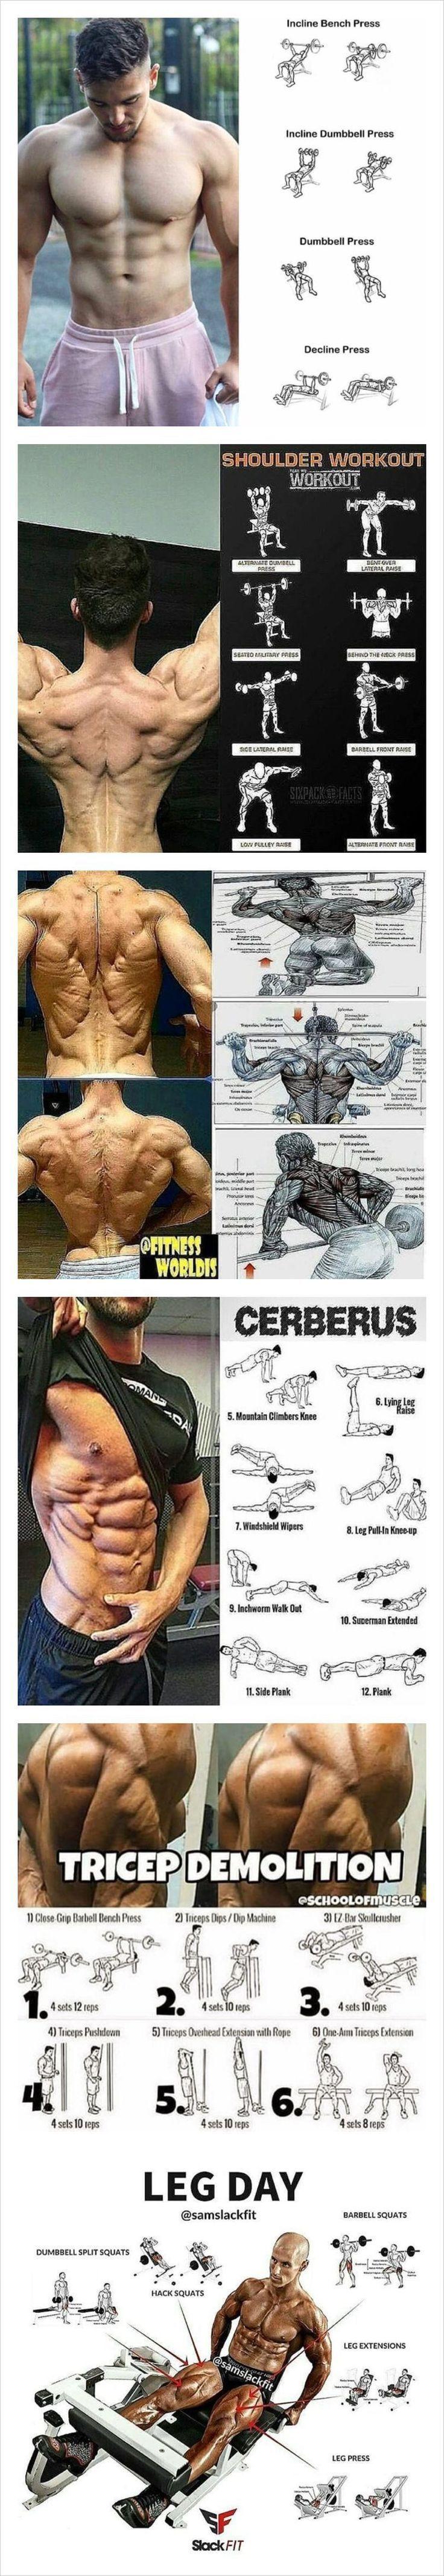 #Fitness #Training #Athlet #Diet #Übung #Zitat #Workout #BodyFat #Gym #Workout